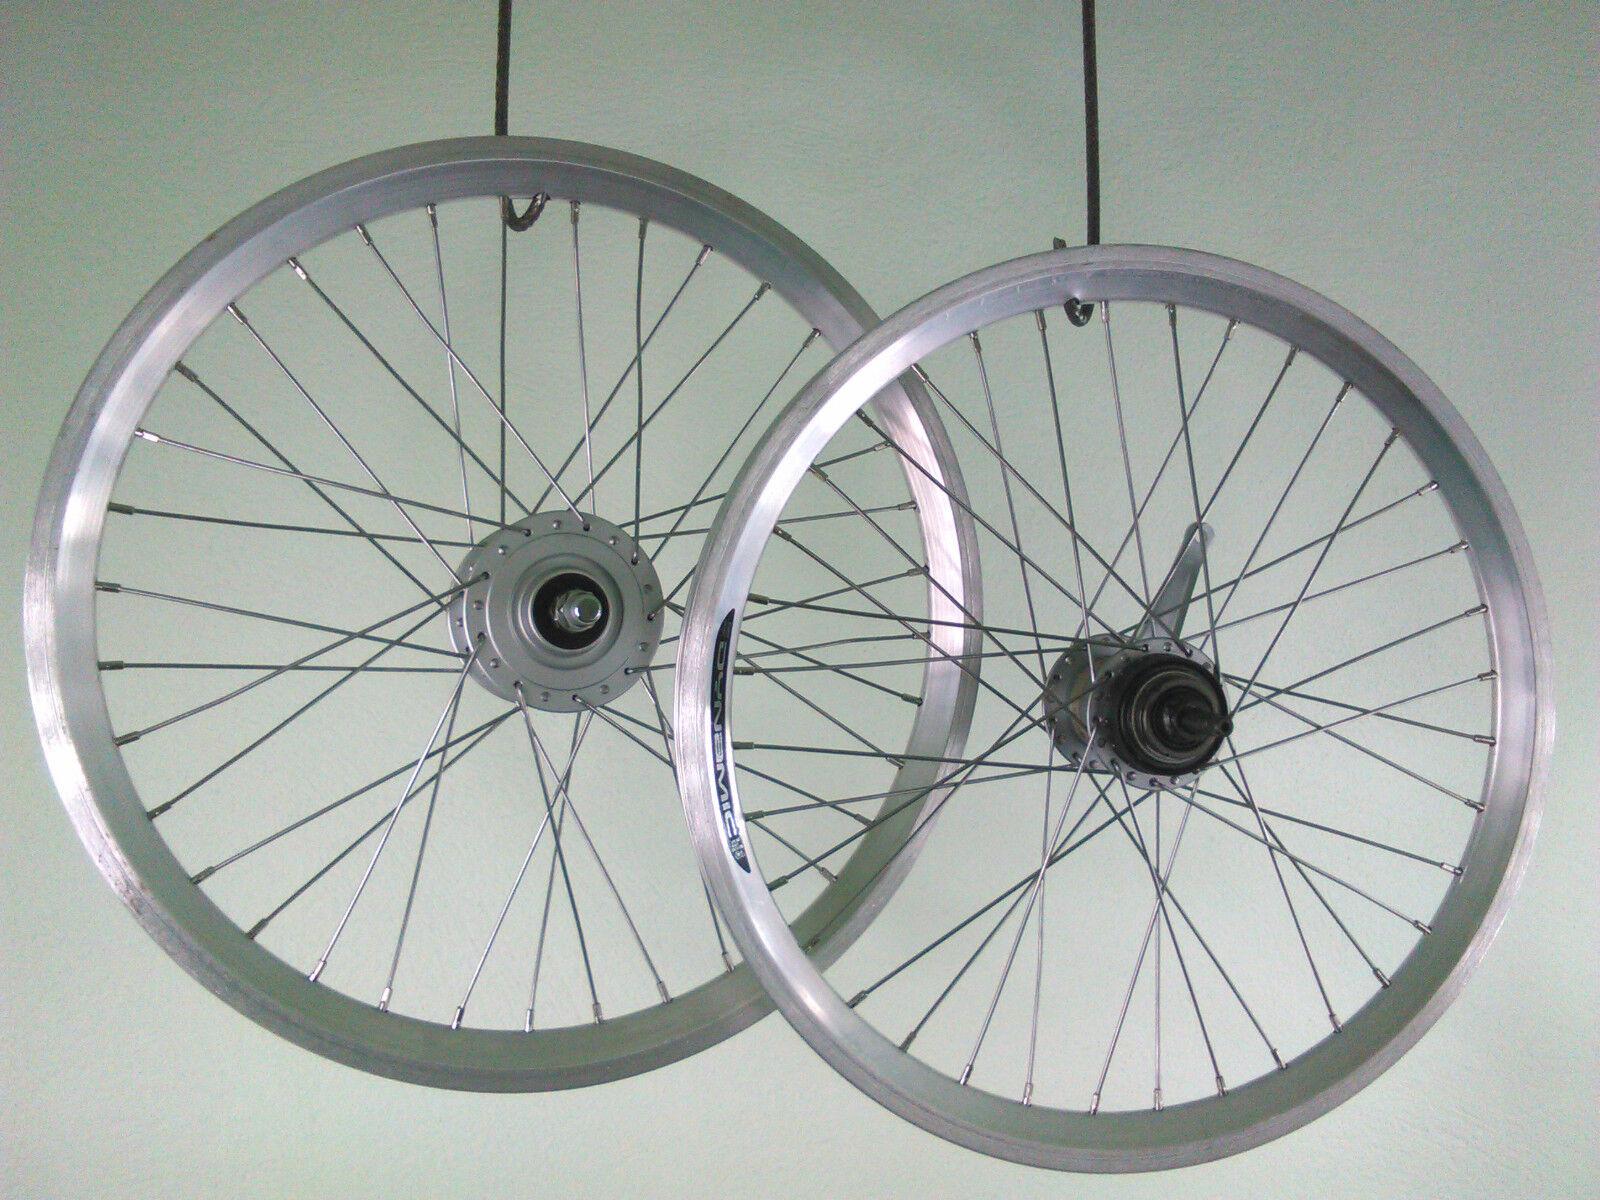 20 pulgadas ruedas Dinamo & Nexus 3 marchas buje circuito nuevo + Zub plata.